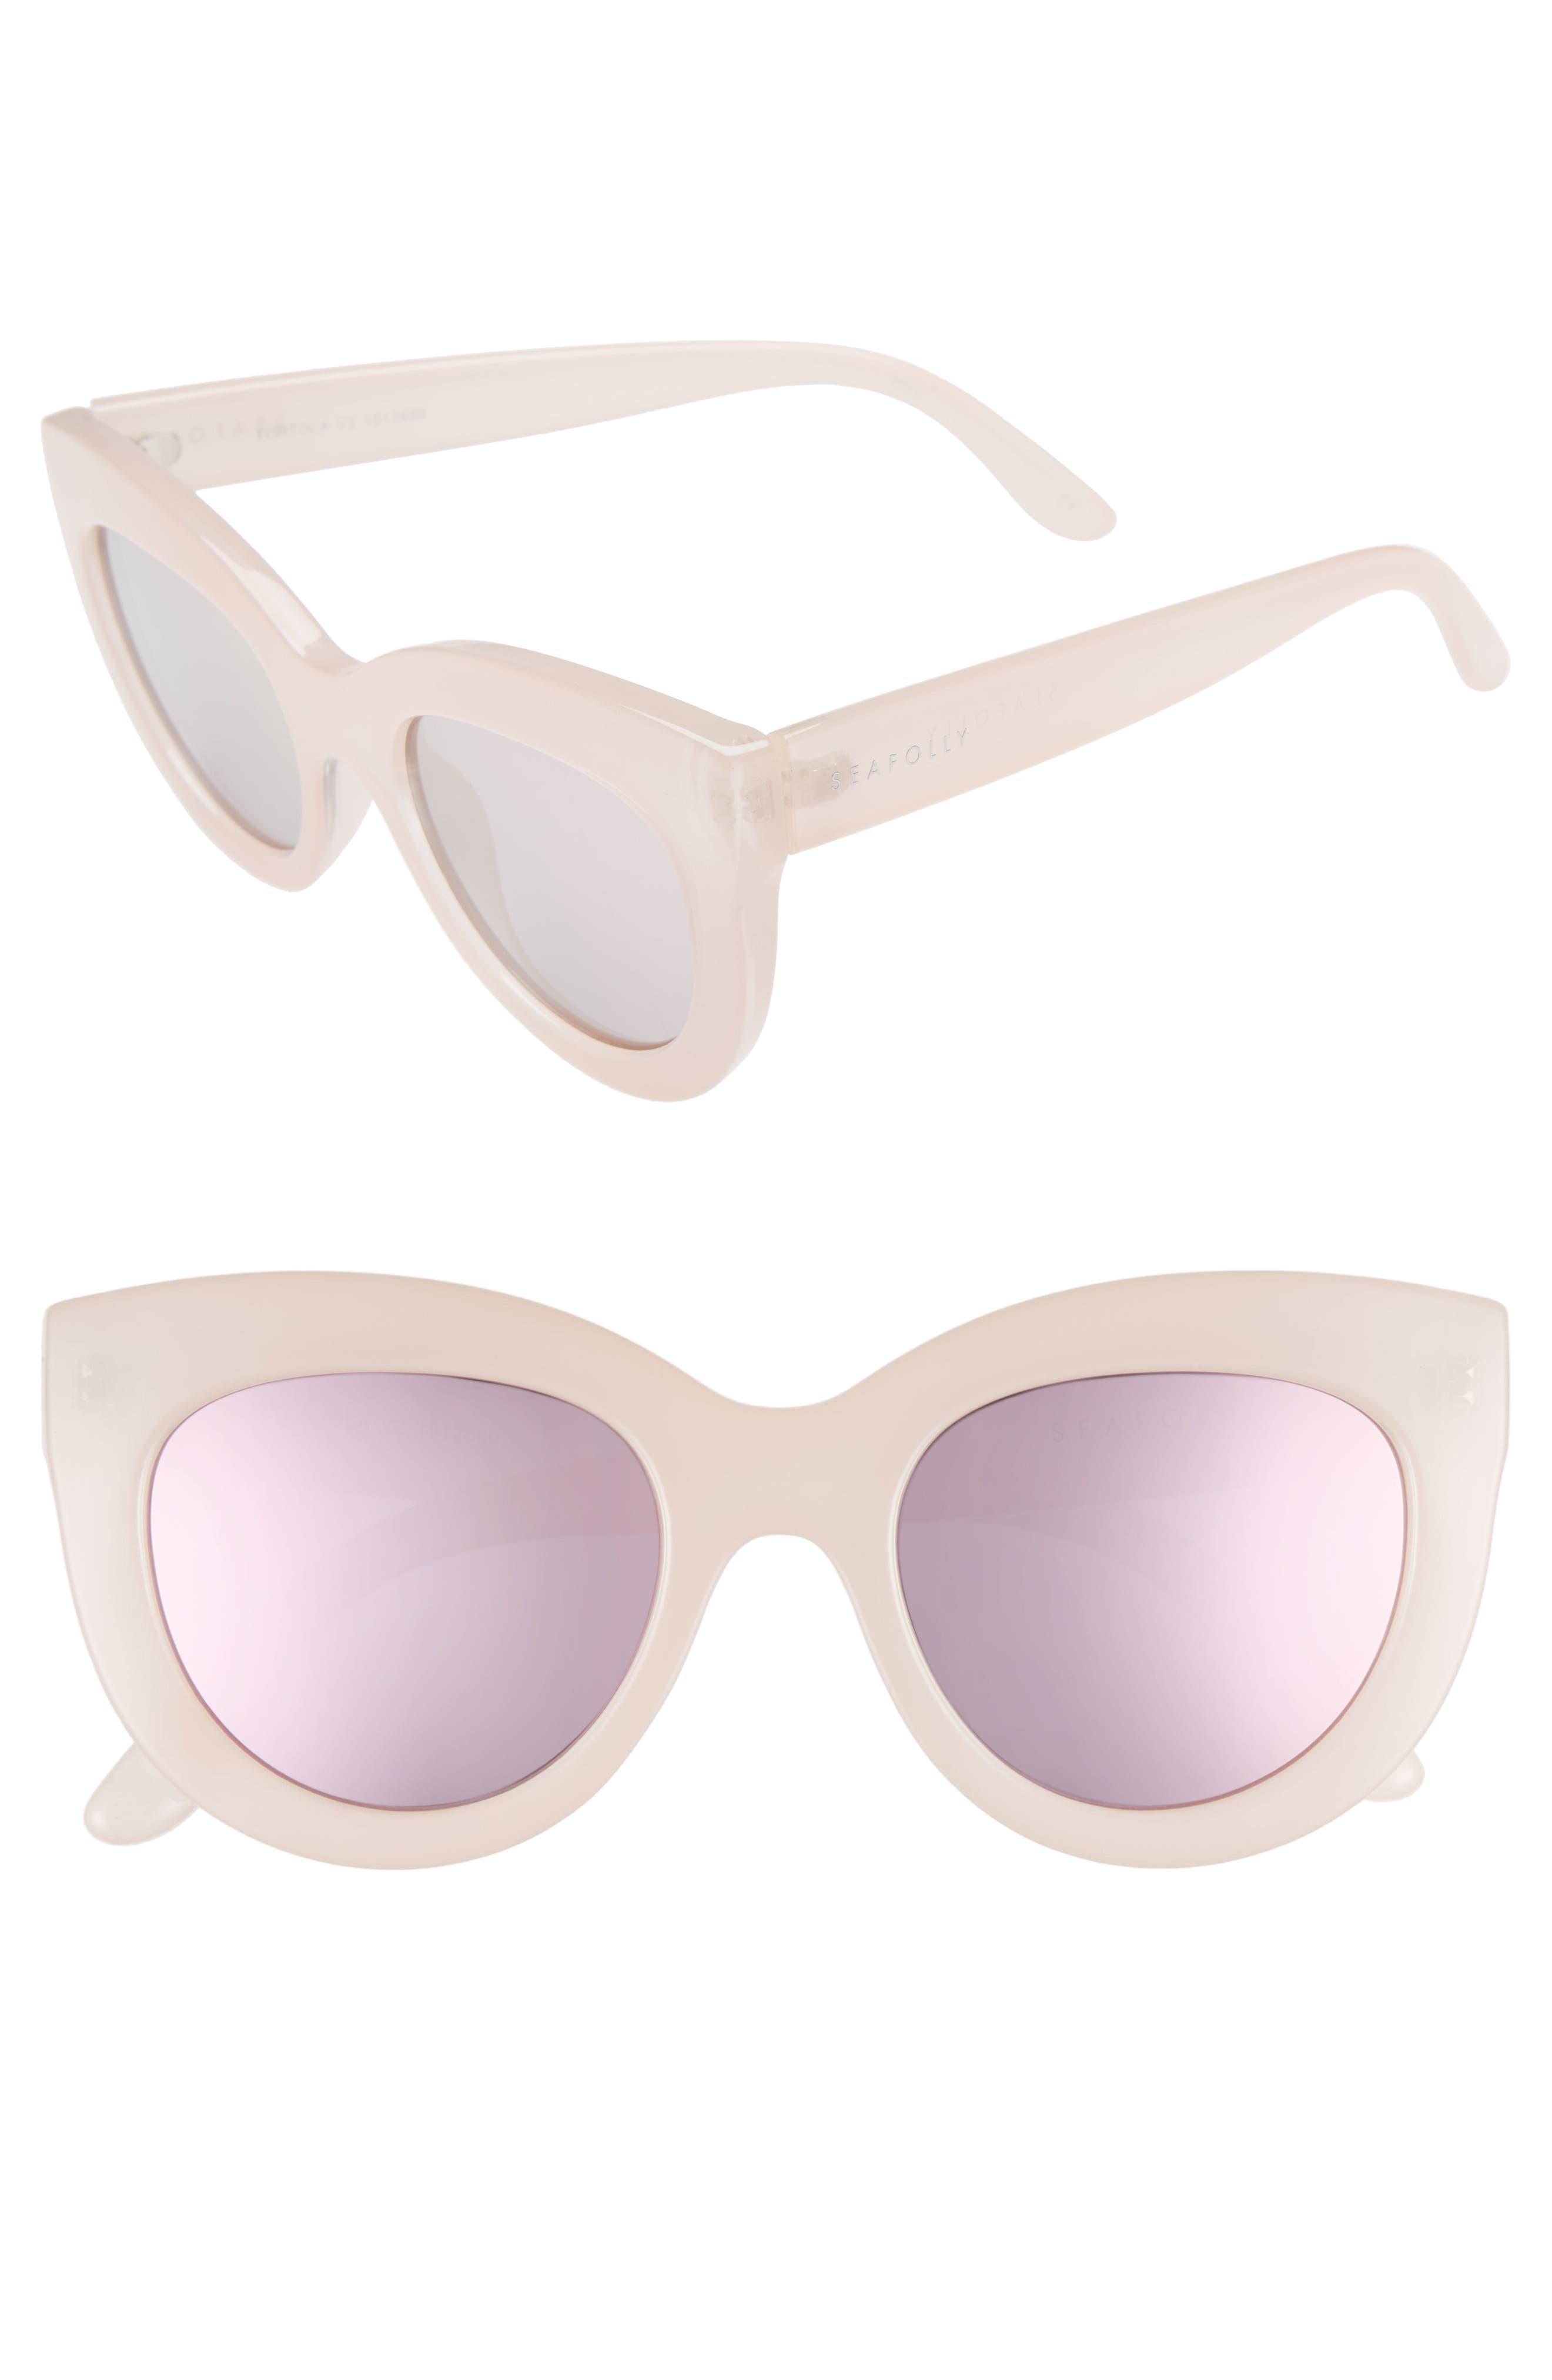 Torola V2 51mm Cat Eye Sunglasses,                             Main thumbnail 1, color,                             Blossom